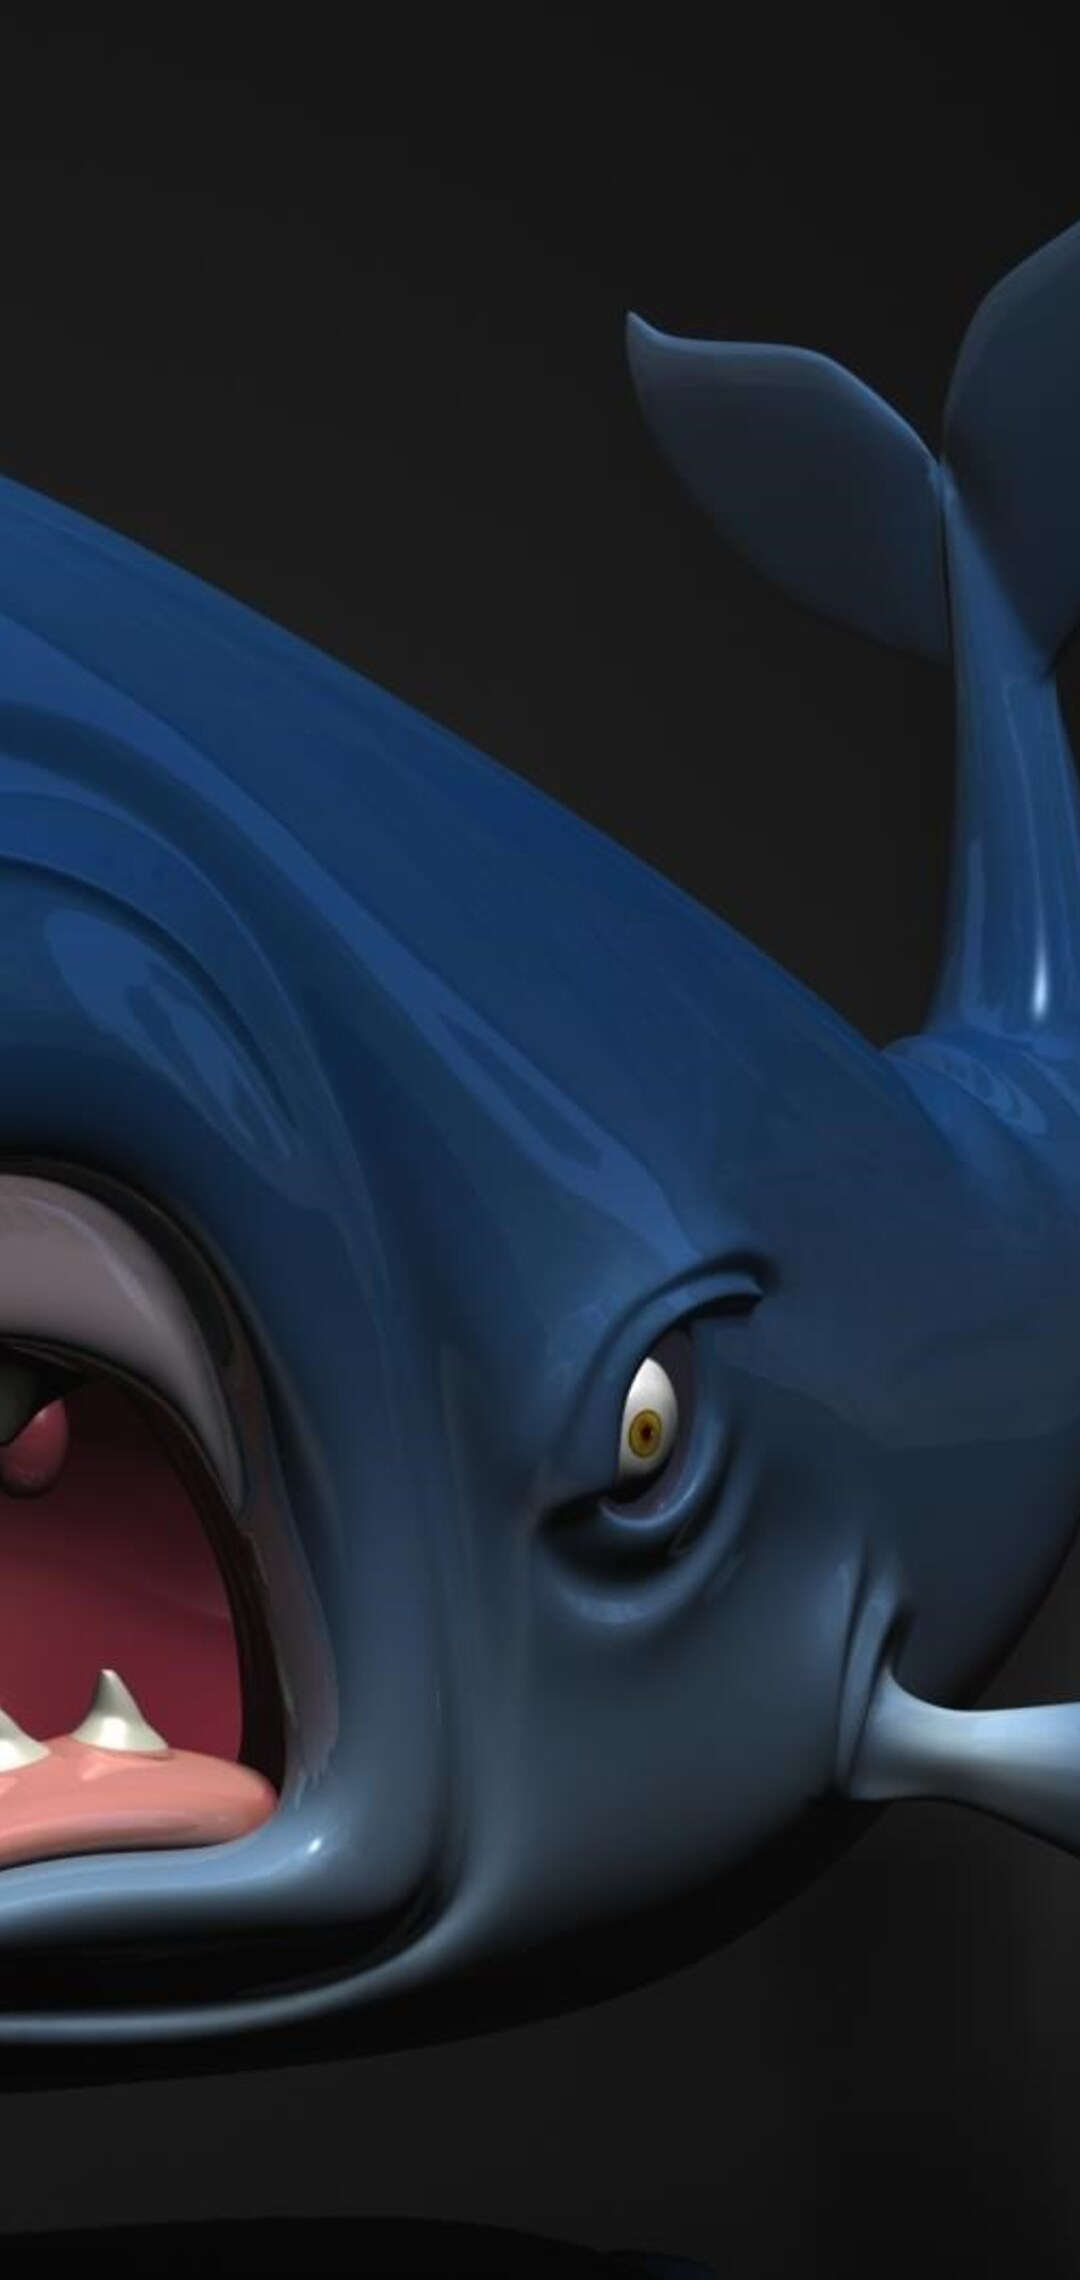 3d-whale-wallpaper.jpg